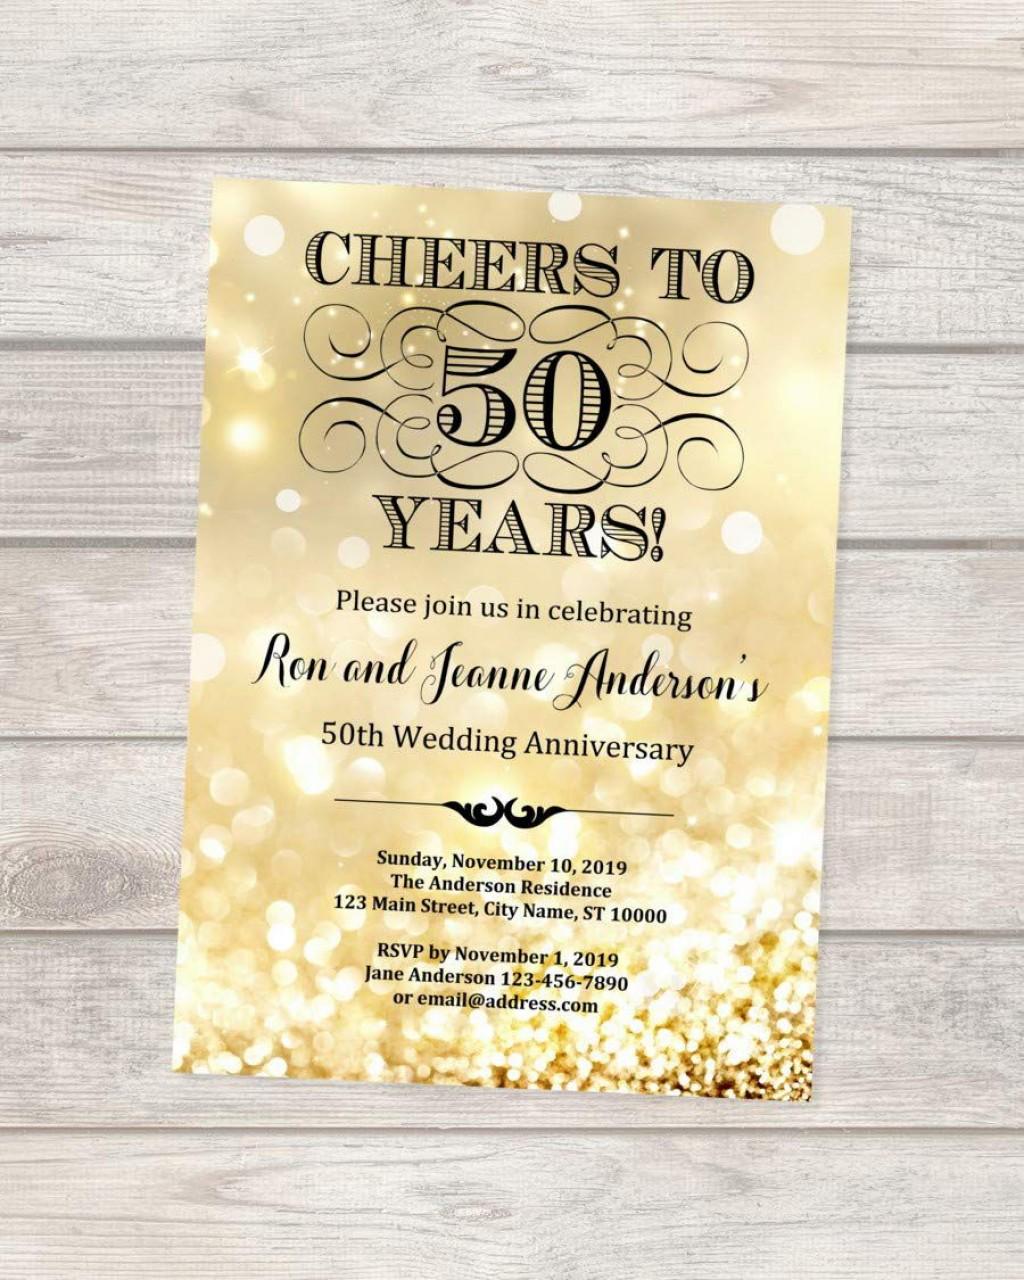 004 Imposing 50th Wedding Anniversary Invitation Design Sample  Designs Wording Card Template Free DownloadLarge